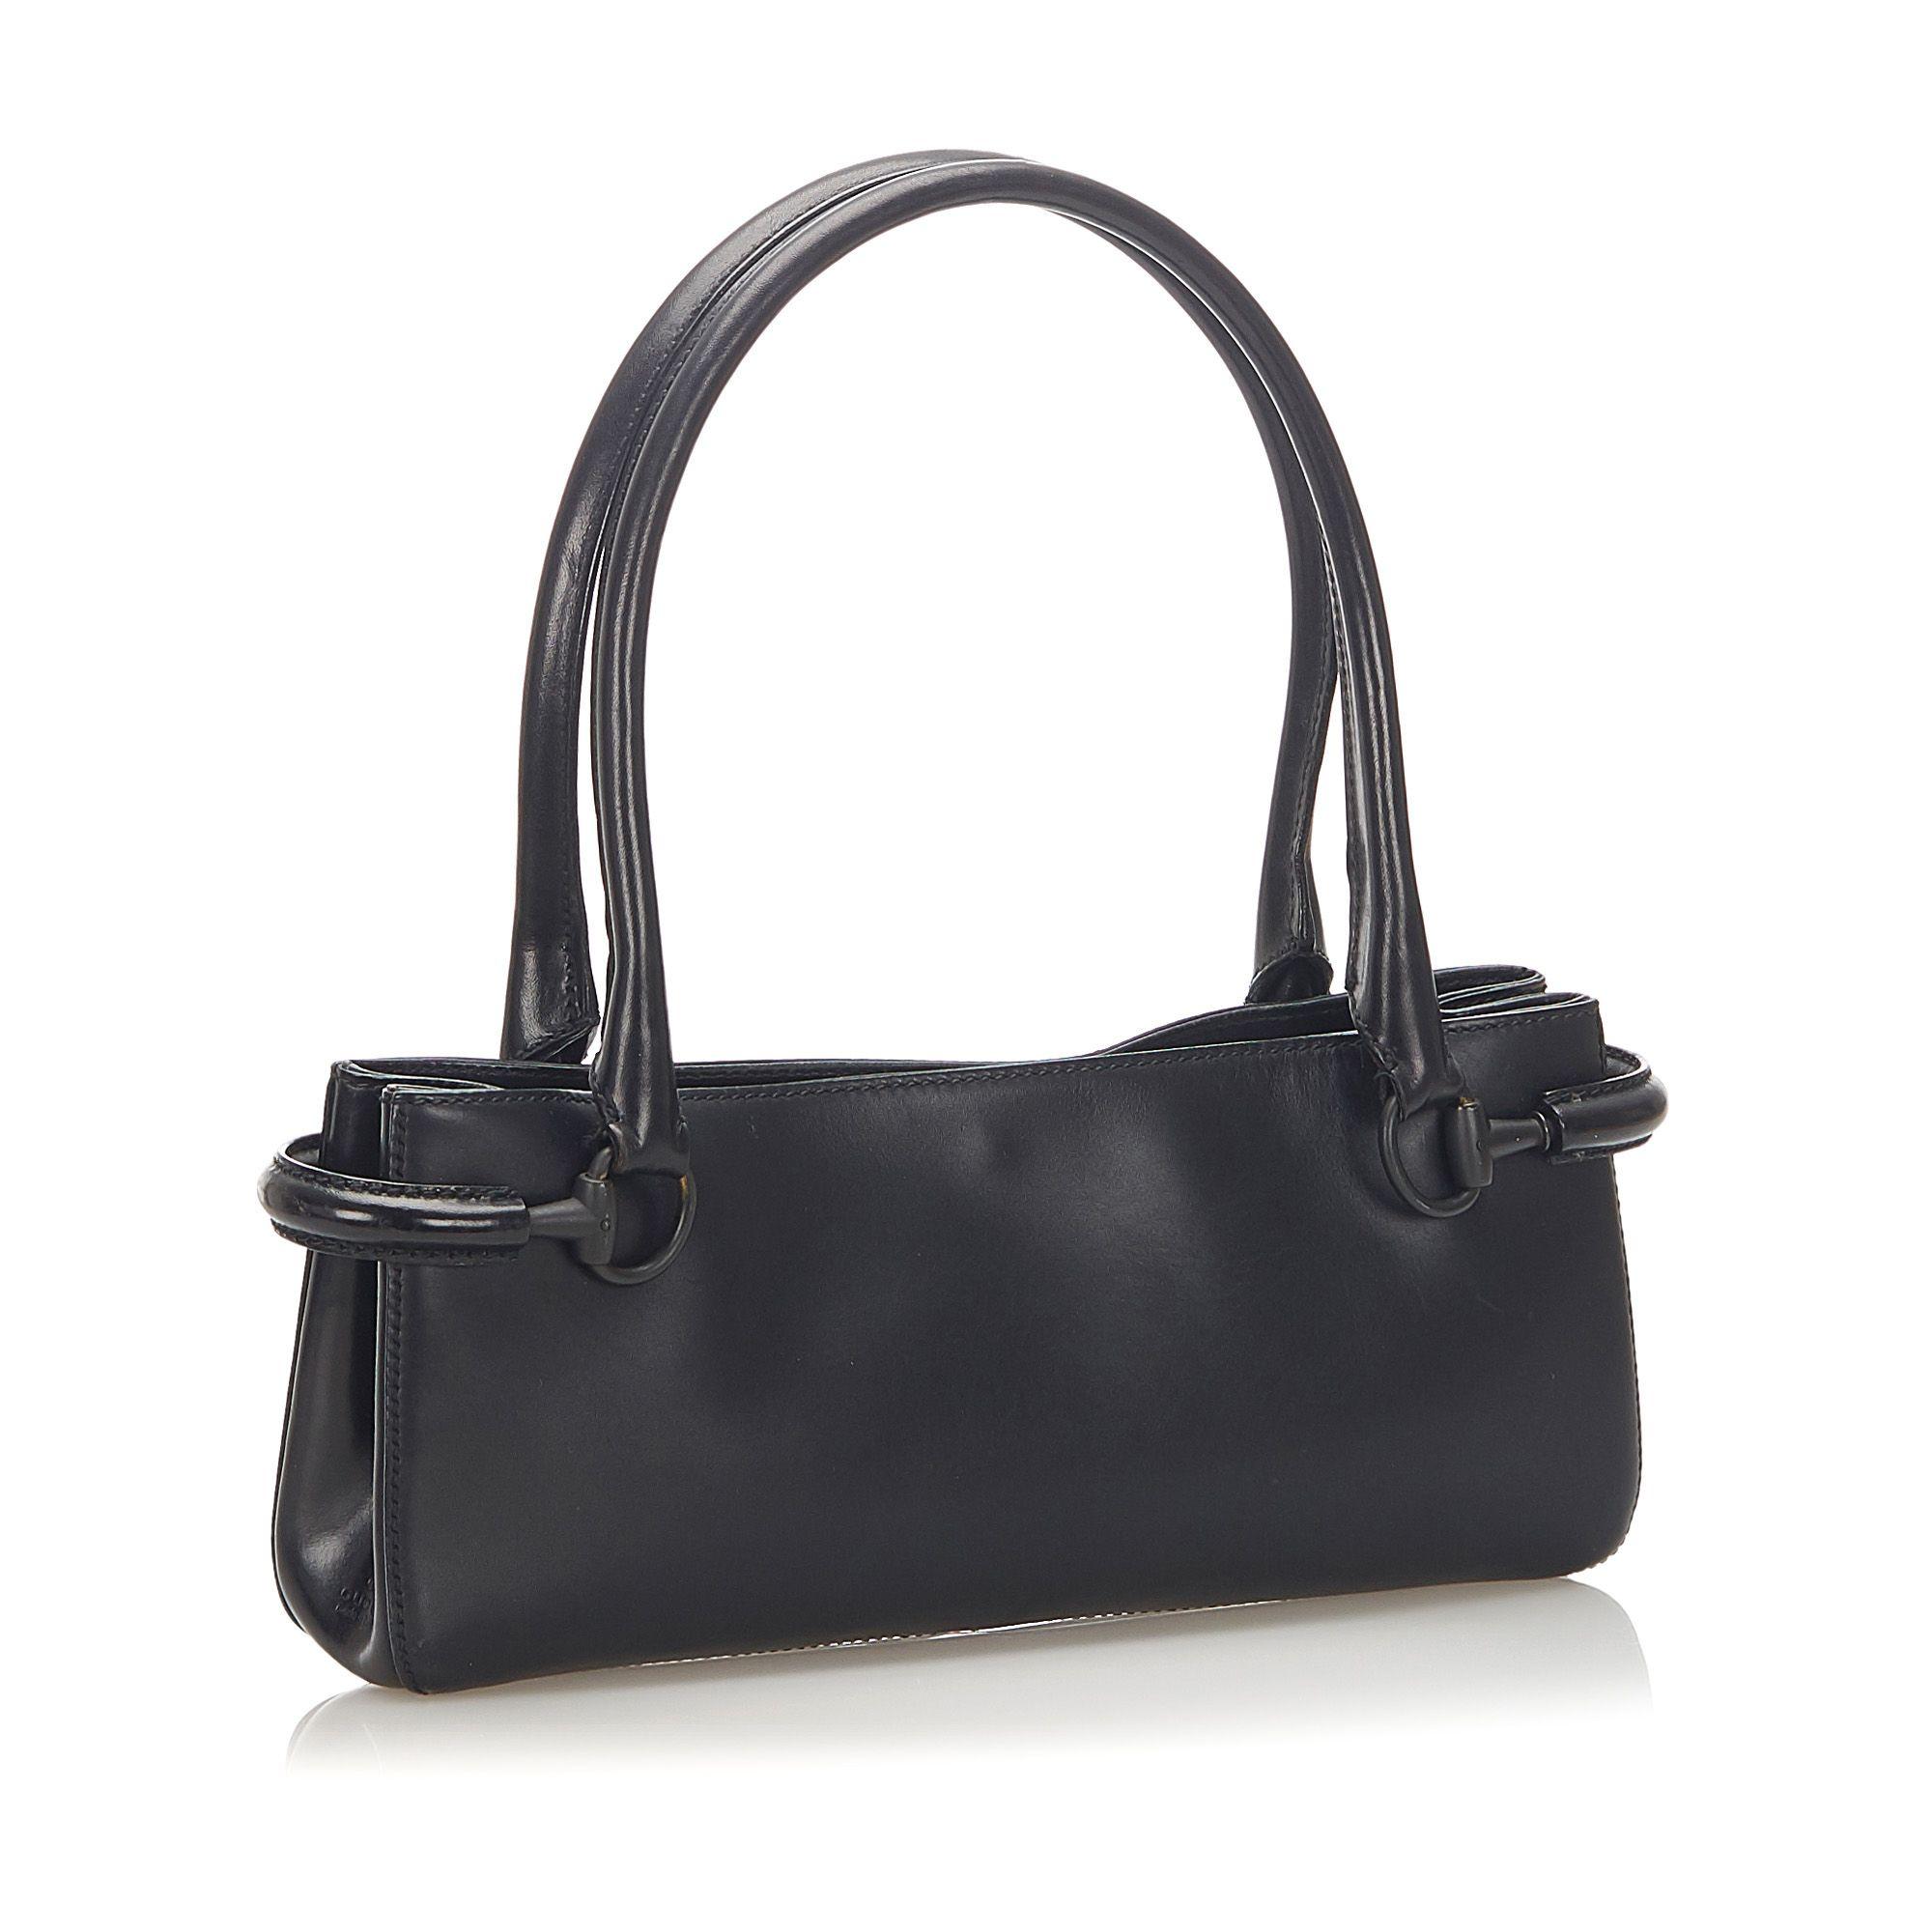 Vintage Gucci Horsebit Leather Handbag Black